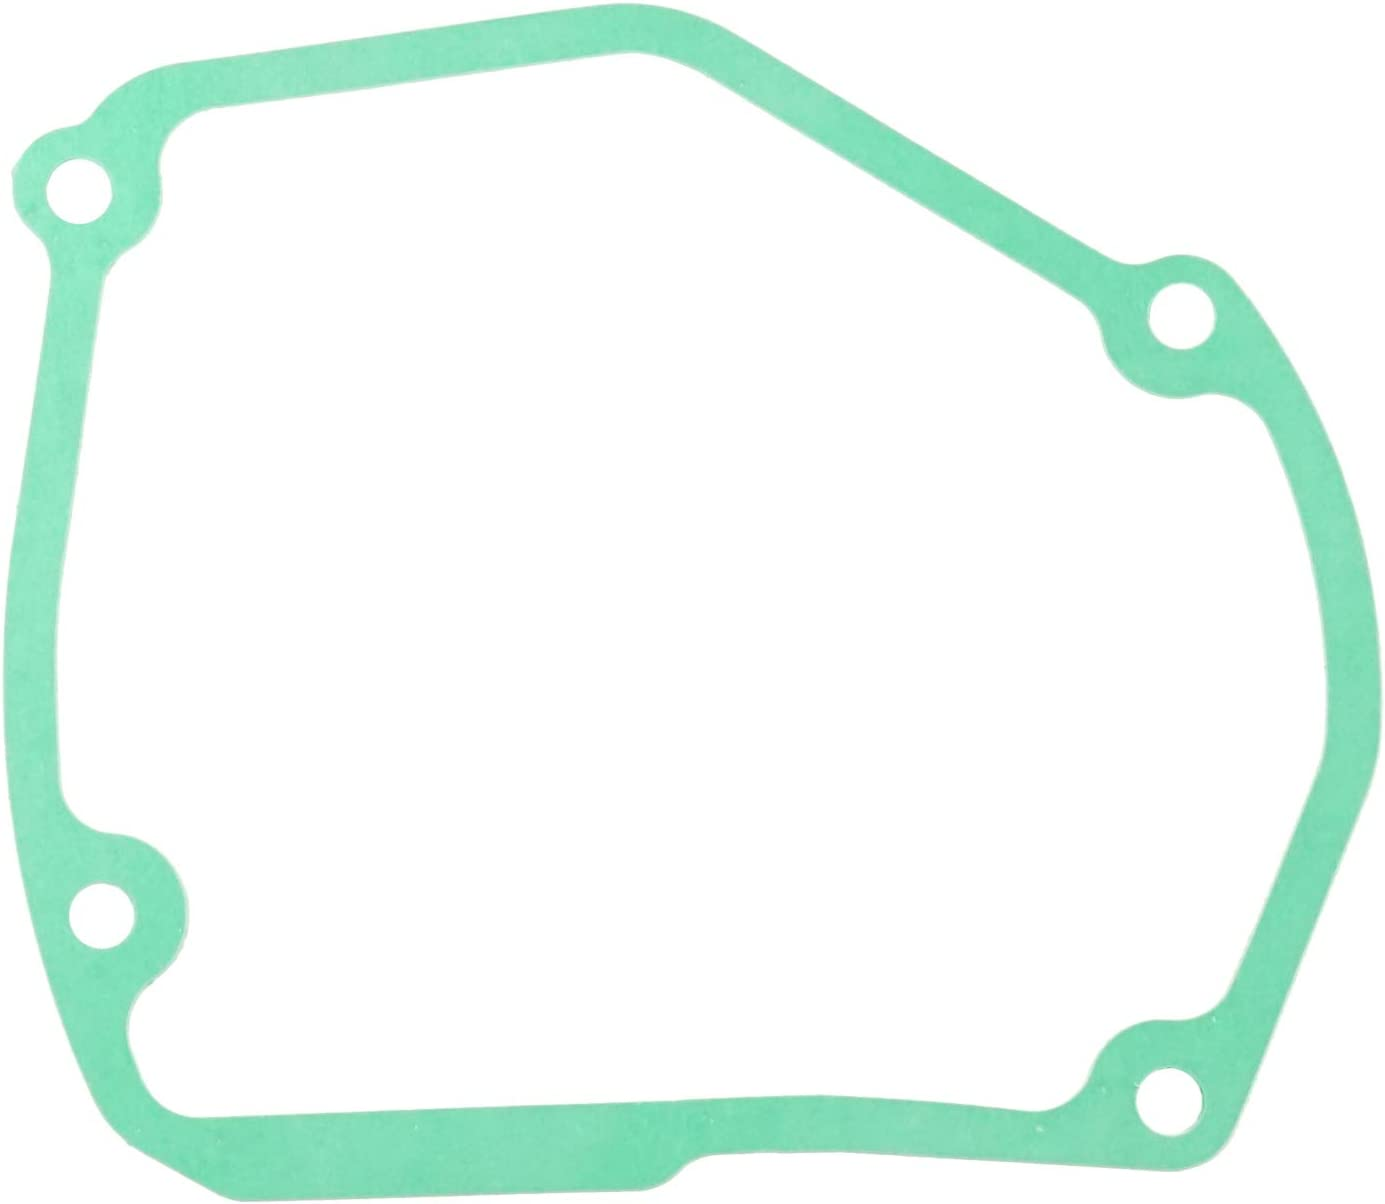 Caltric Stator Cover Gasket for Suzuki Rm125 1998 1999-2008 11483-36E11 11483-36E10